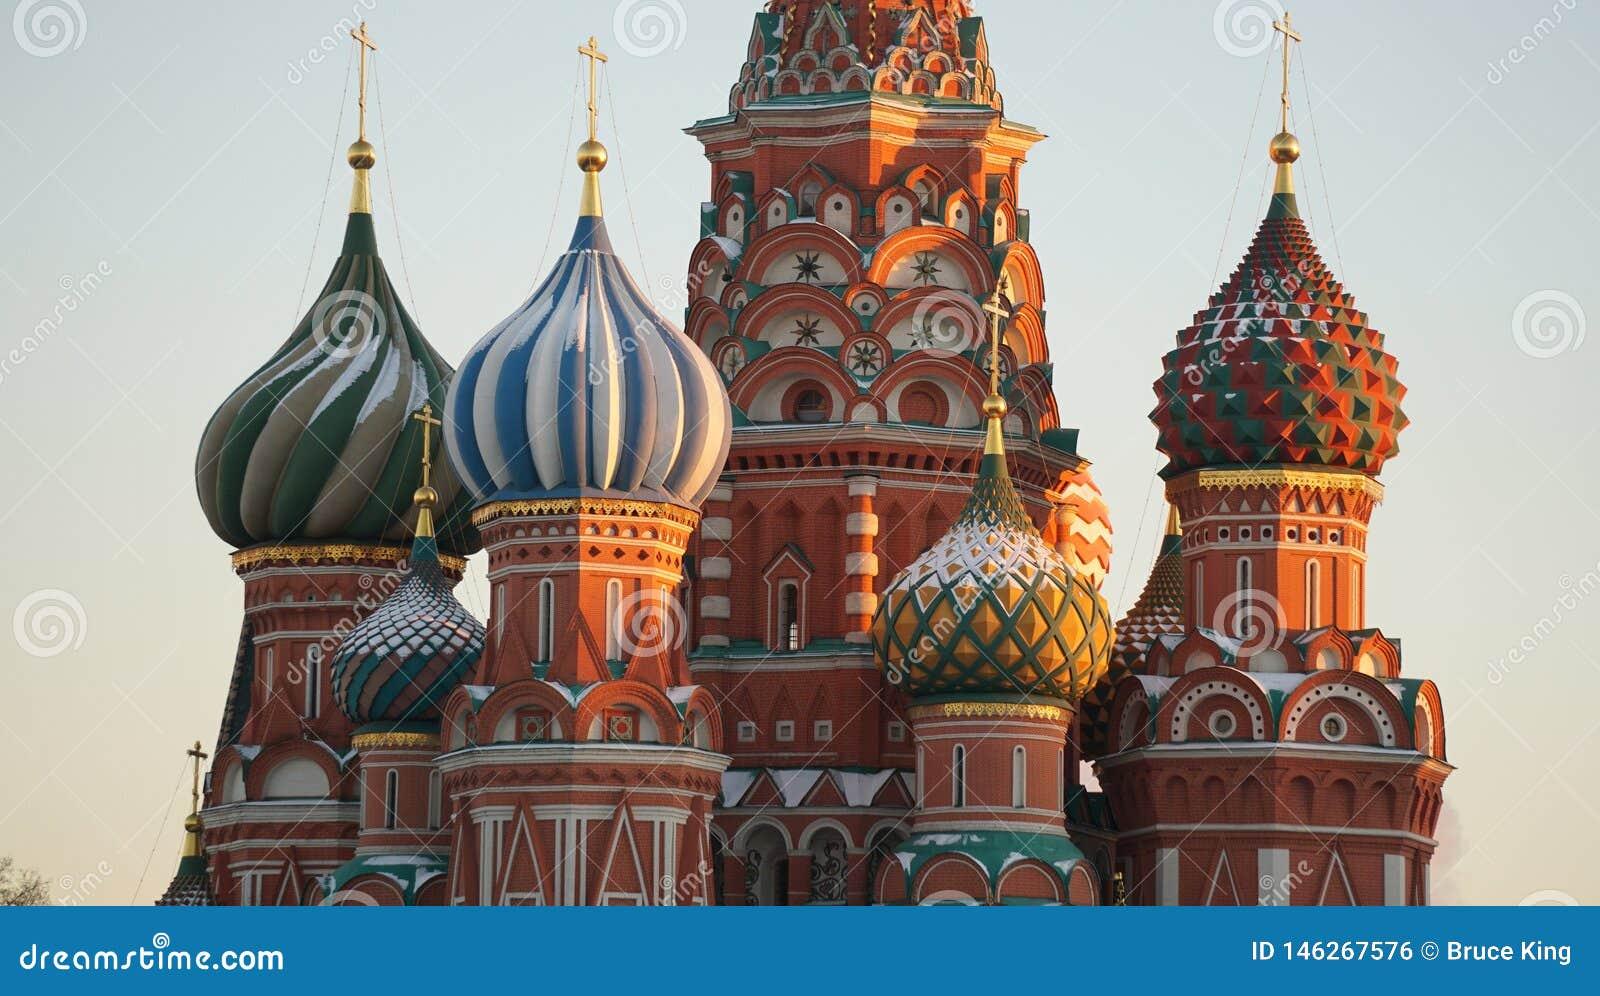 Russische Cathedralï ¼ ŒChristian van het churchï¼ Basilicum ŒSaint